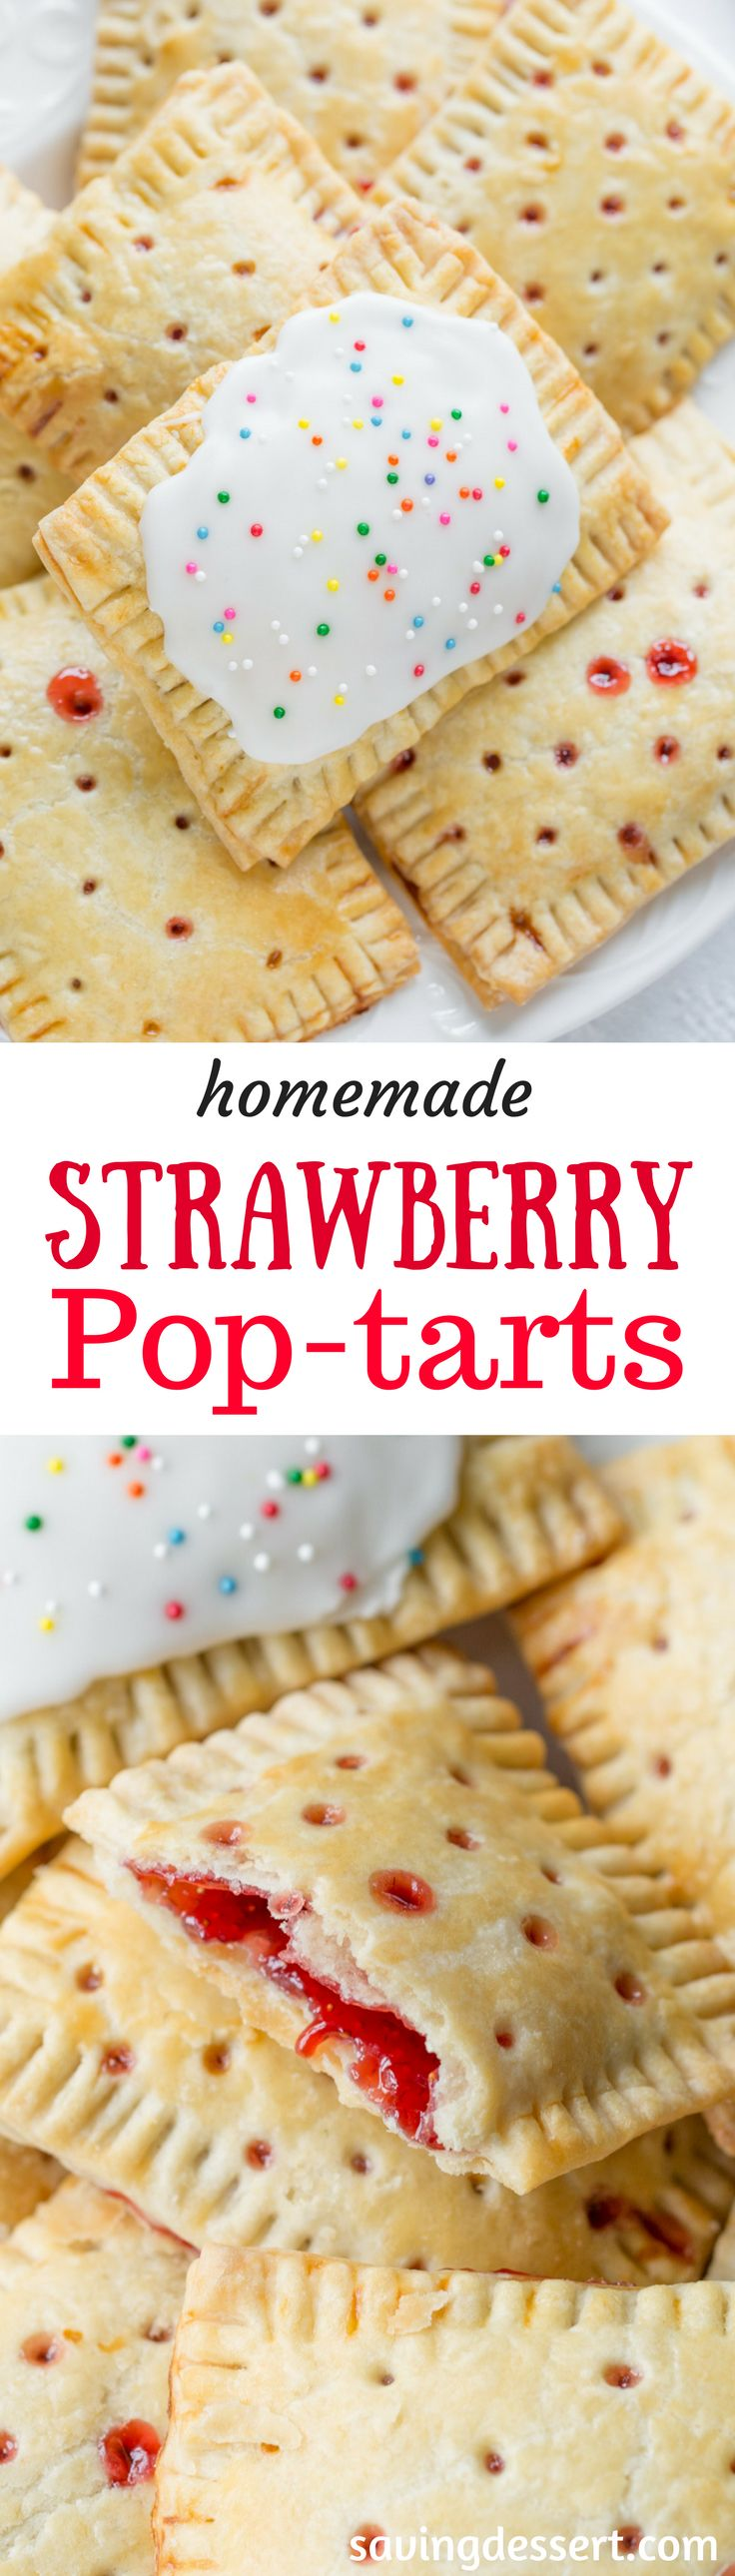 Homemade Strawberry Pop-tarts - a flaky hand pie filled with strawberry jam.  www.savingdessert.com